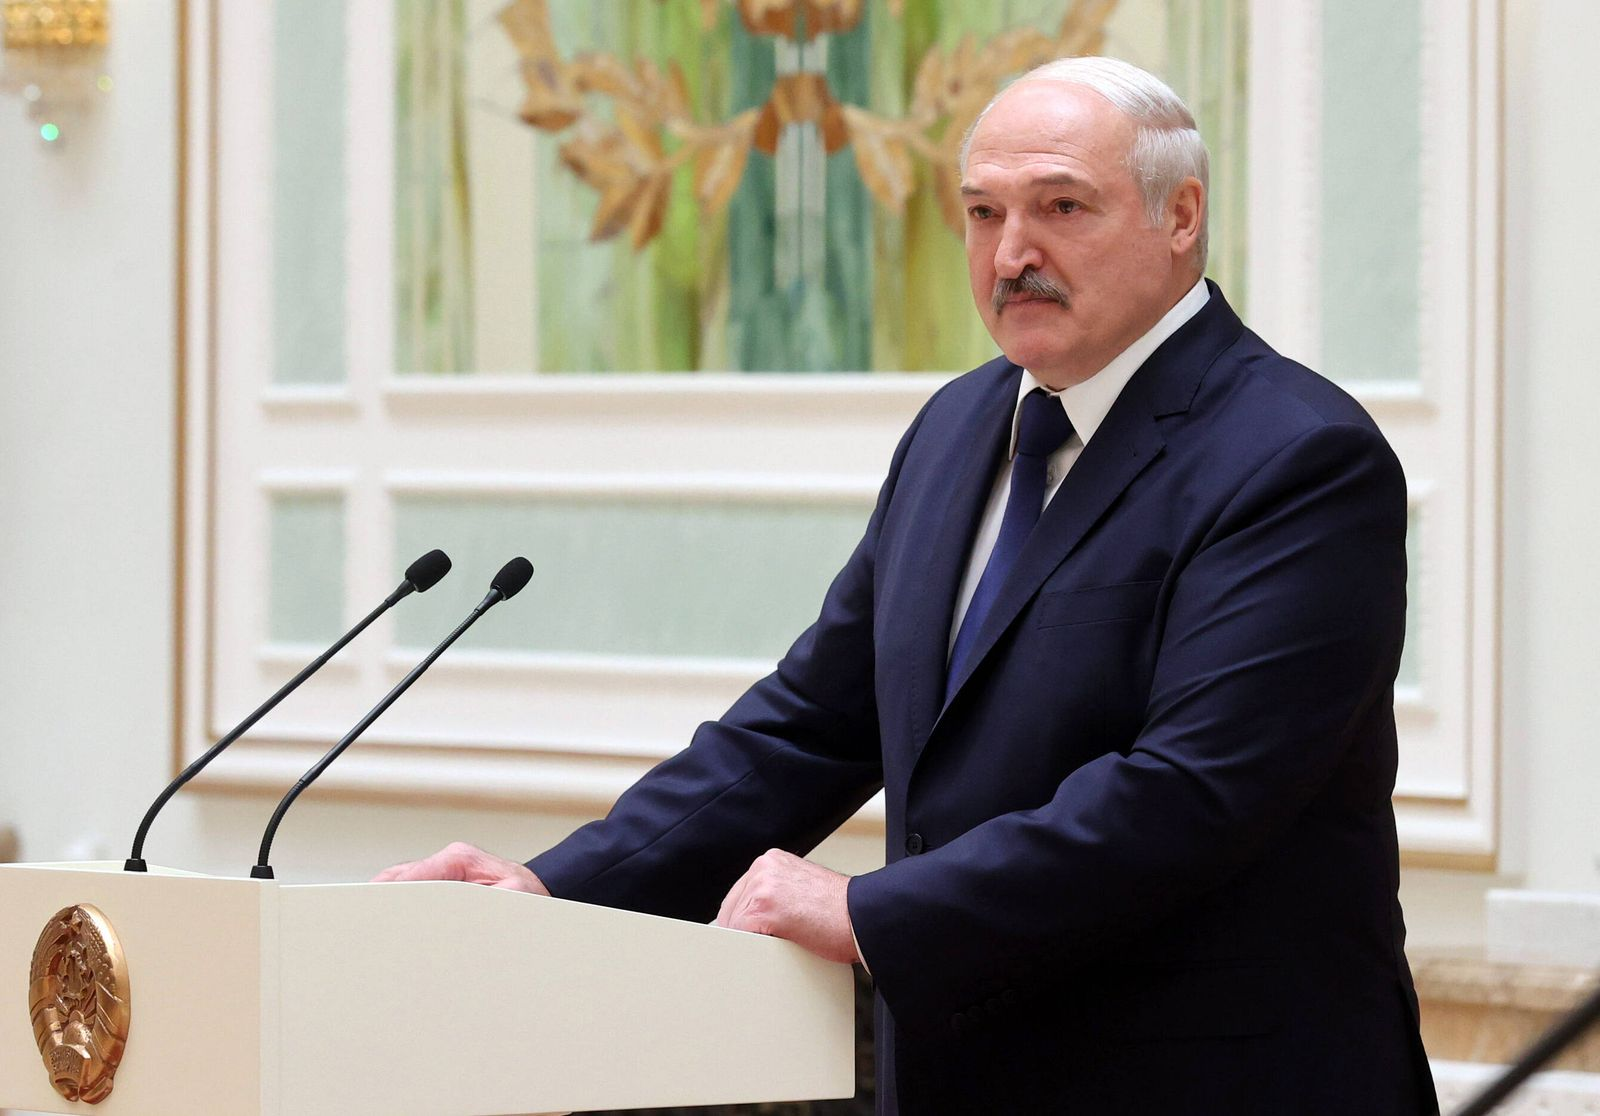 MINSK, BELARUS - OCTOBER 30, 2020: Belarus President Alexander Lukashenko during an introduction ceremony for the newly